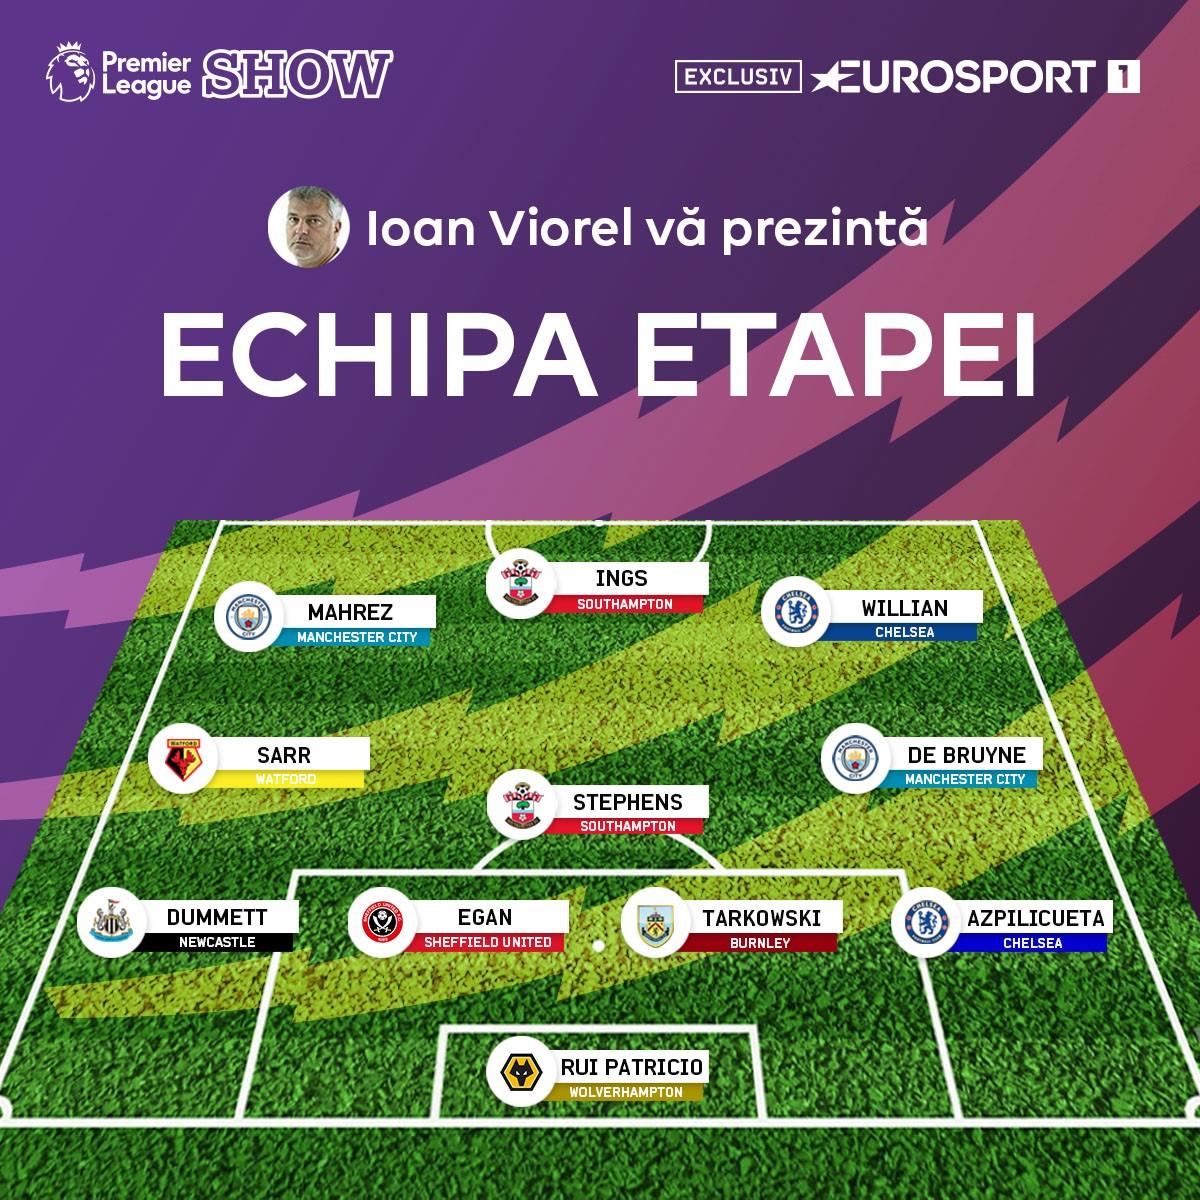 https://i.eurosport.com/2019/12/24/2742168.jpg